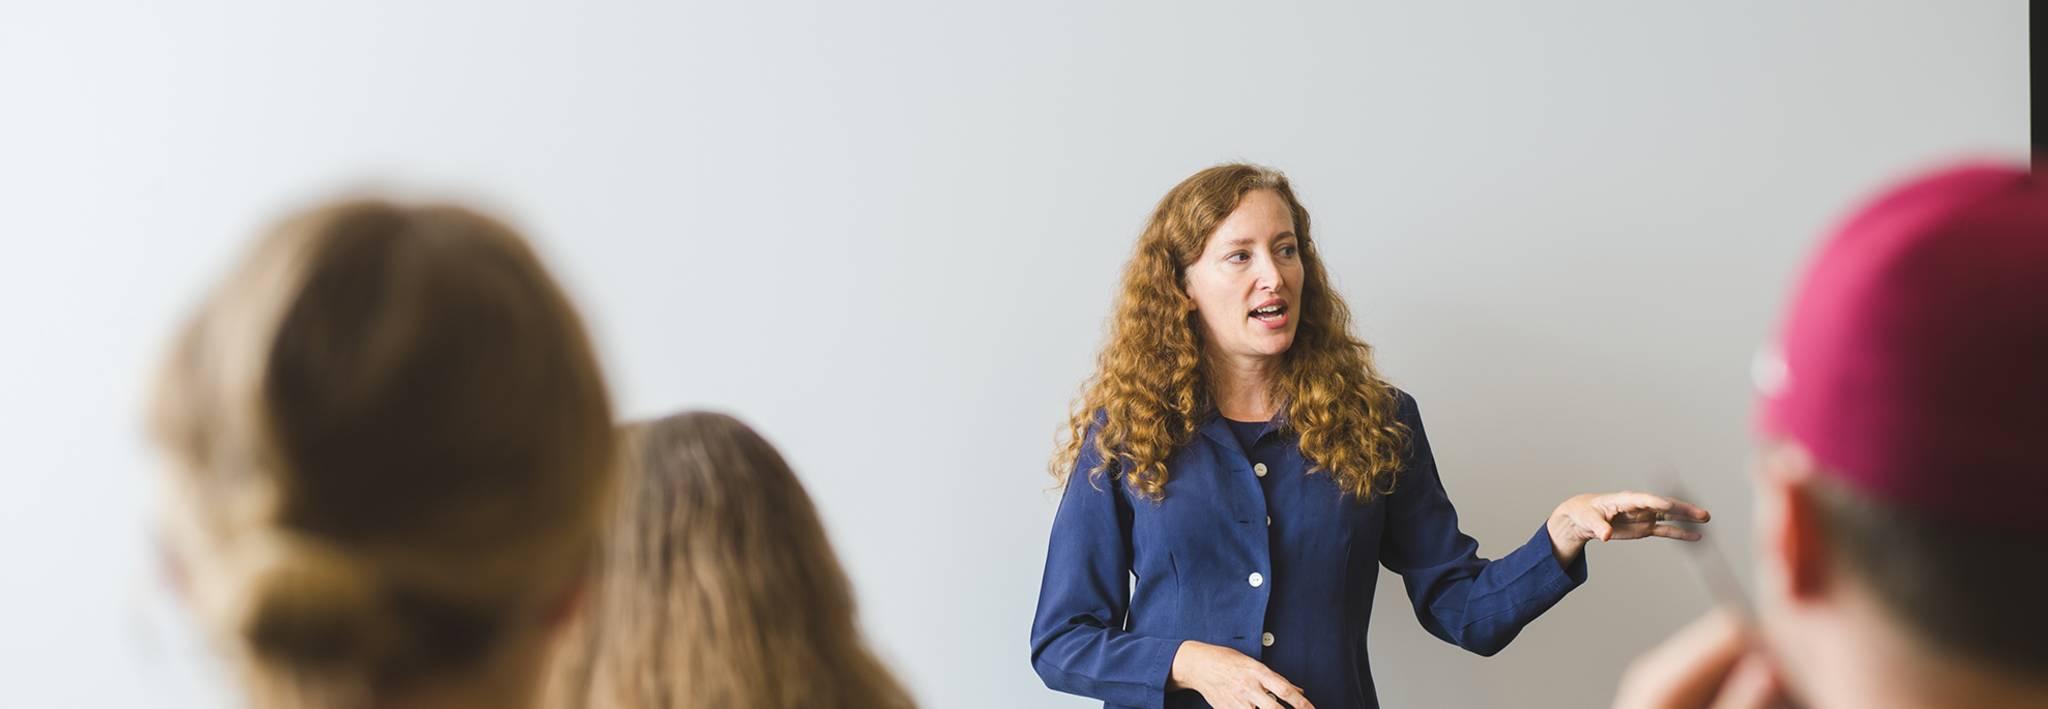 CCU professor Nahanni Freeman teaching a class.